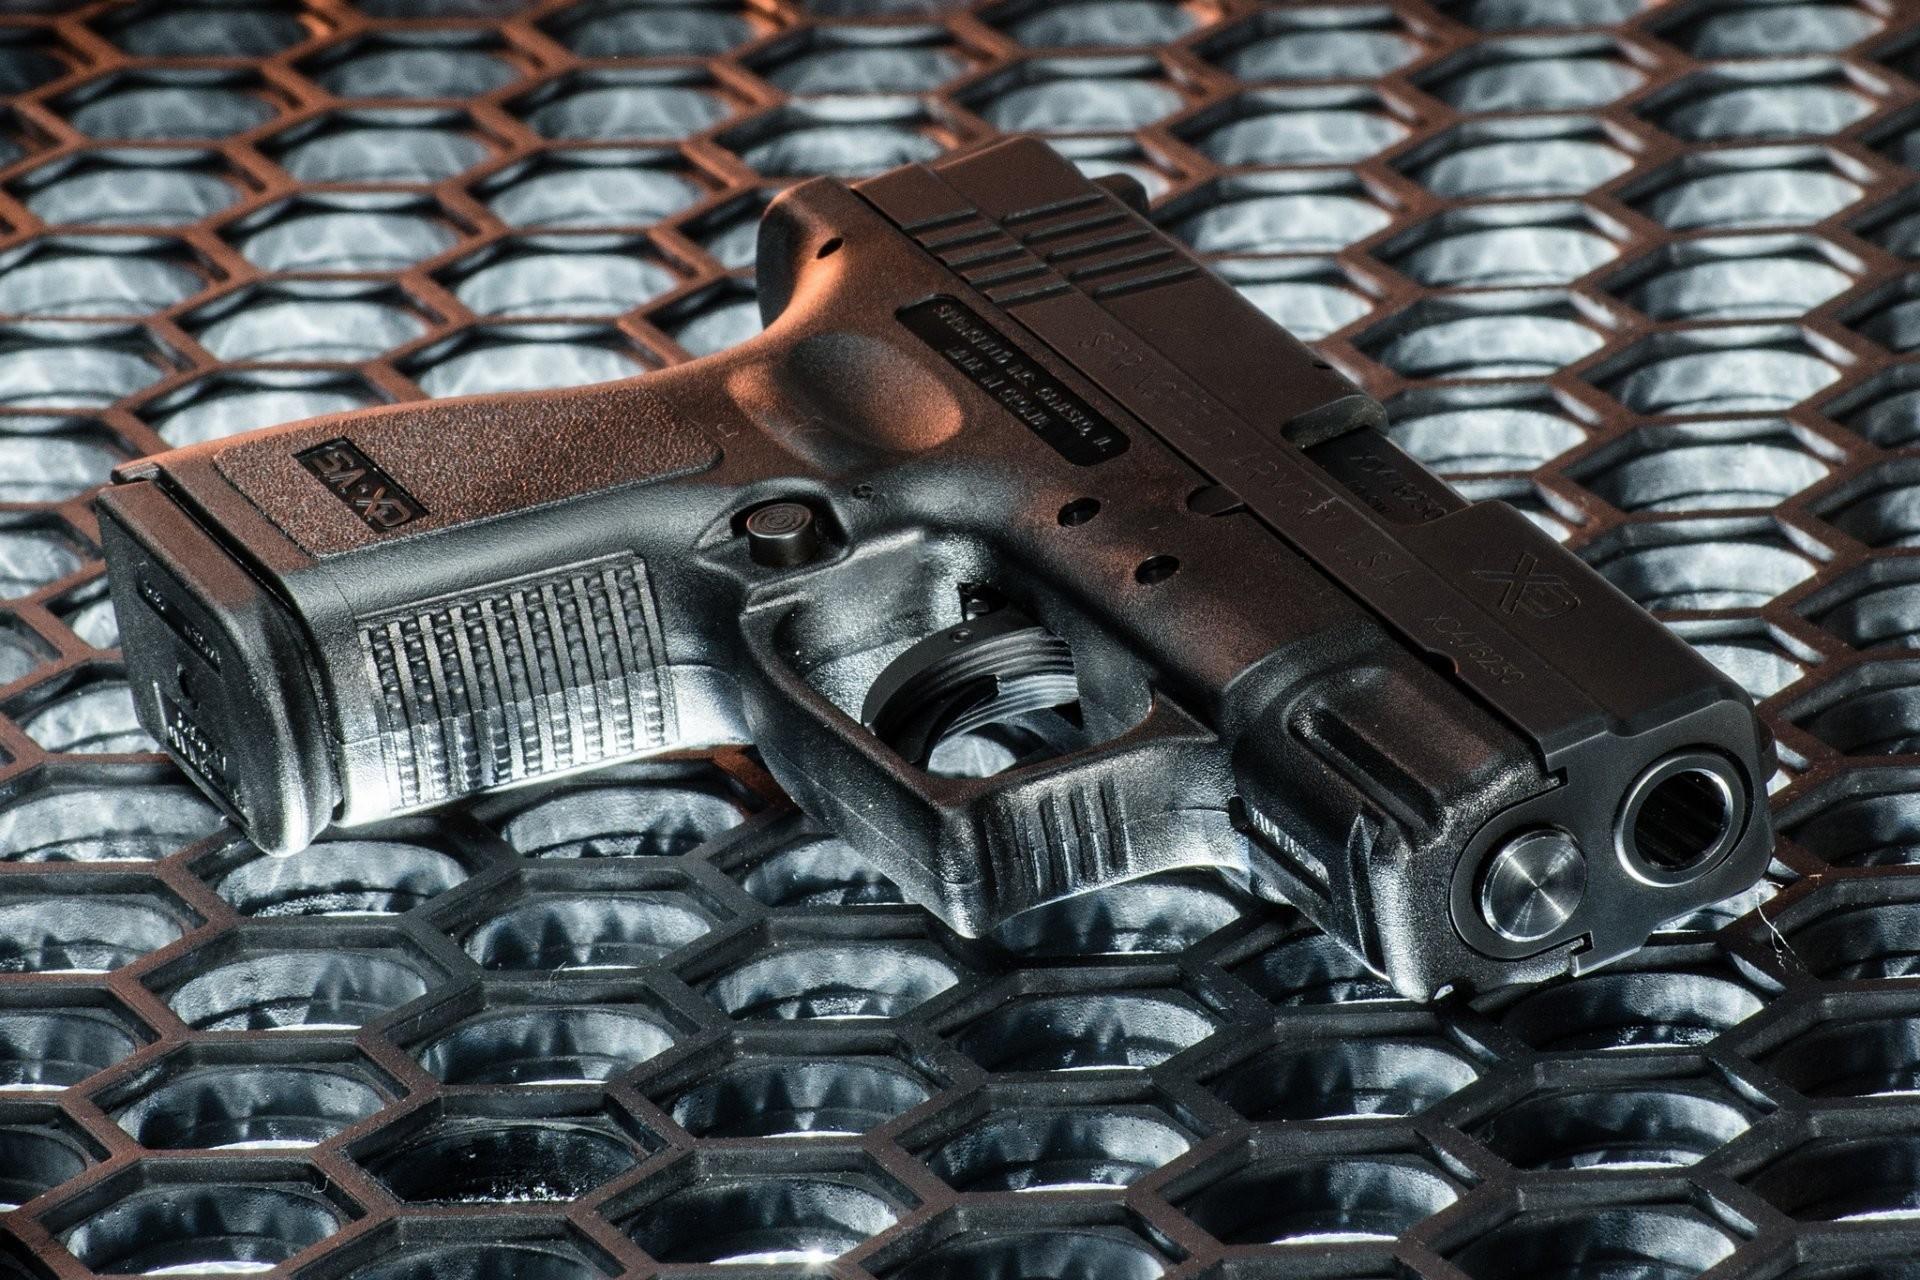 springfield armory semi-automatic gun weapon